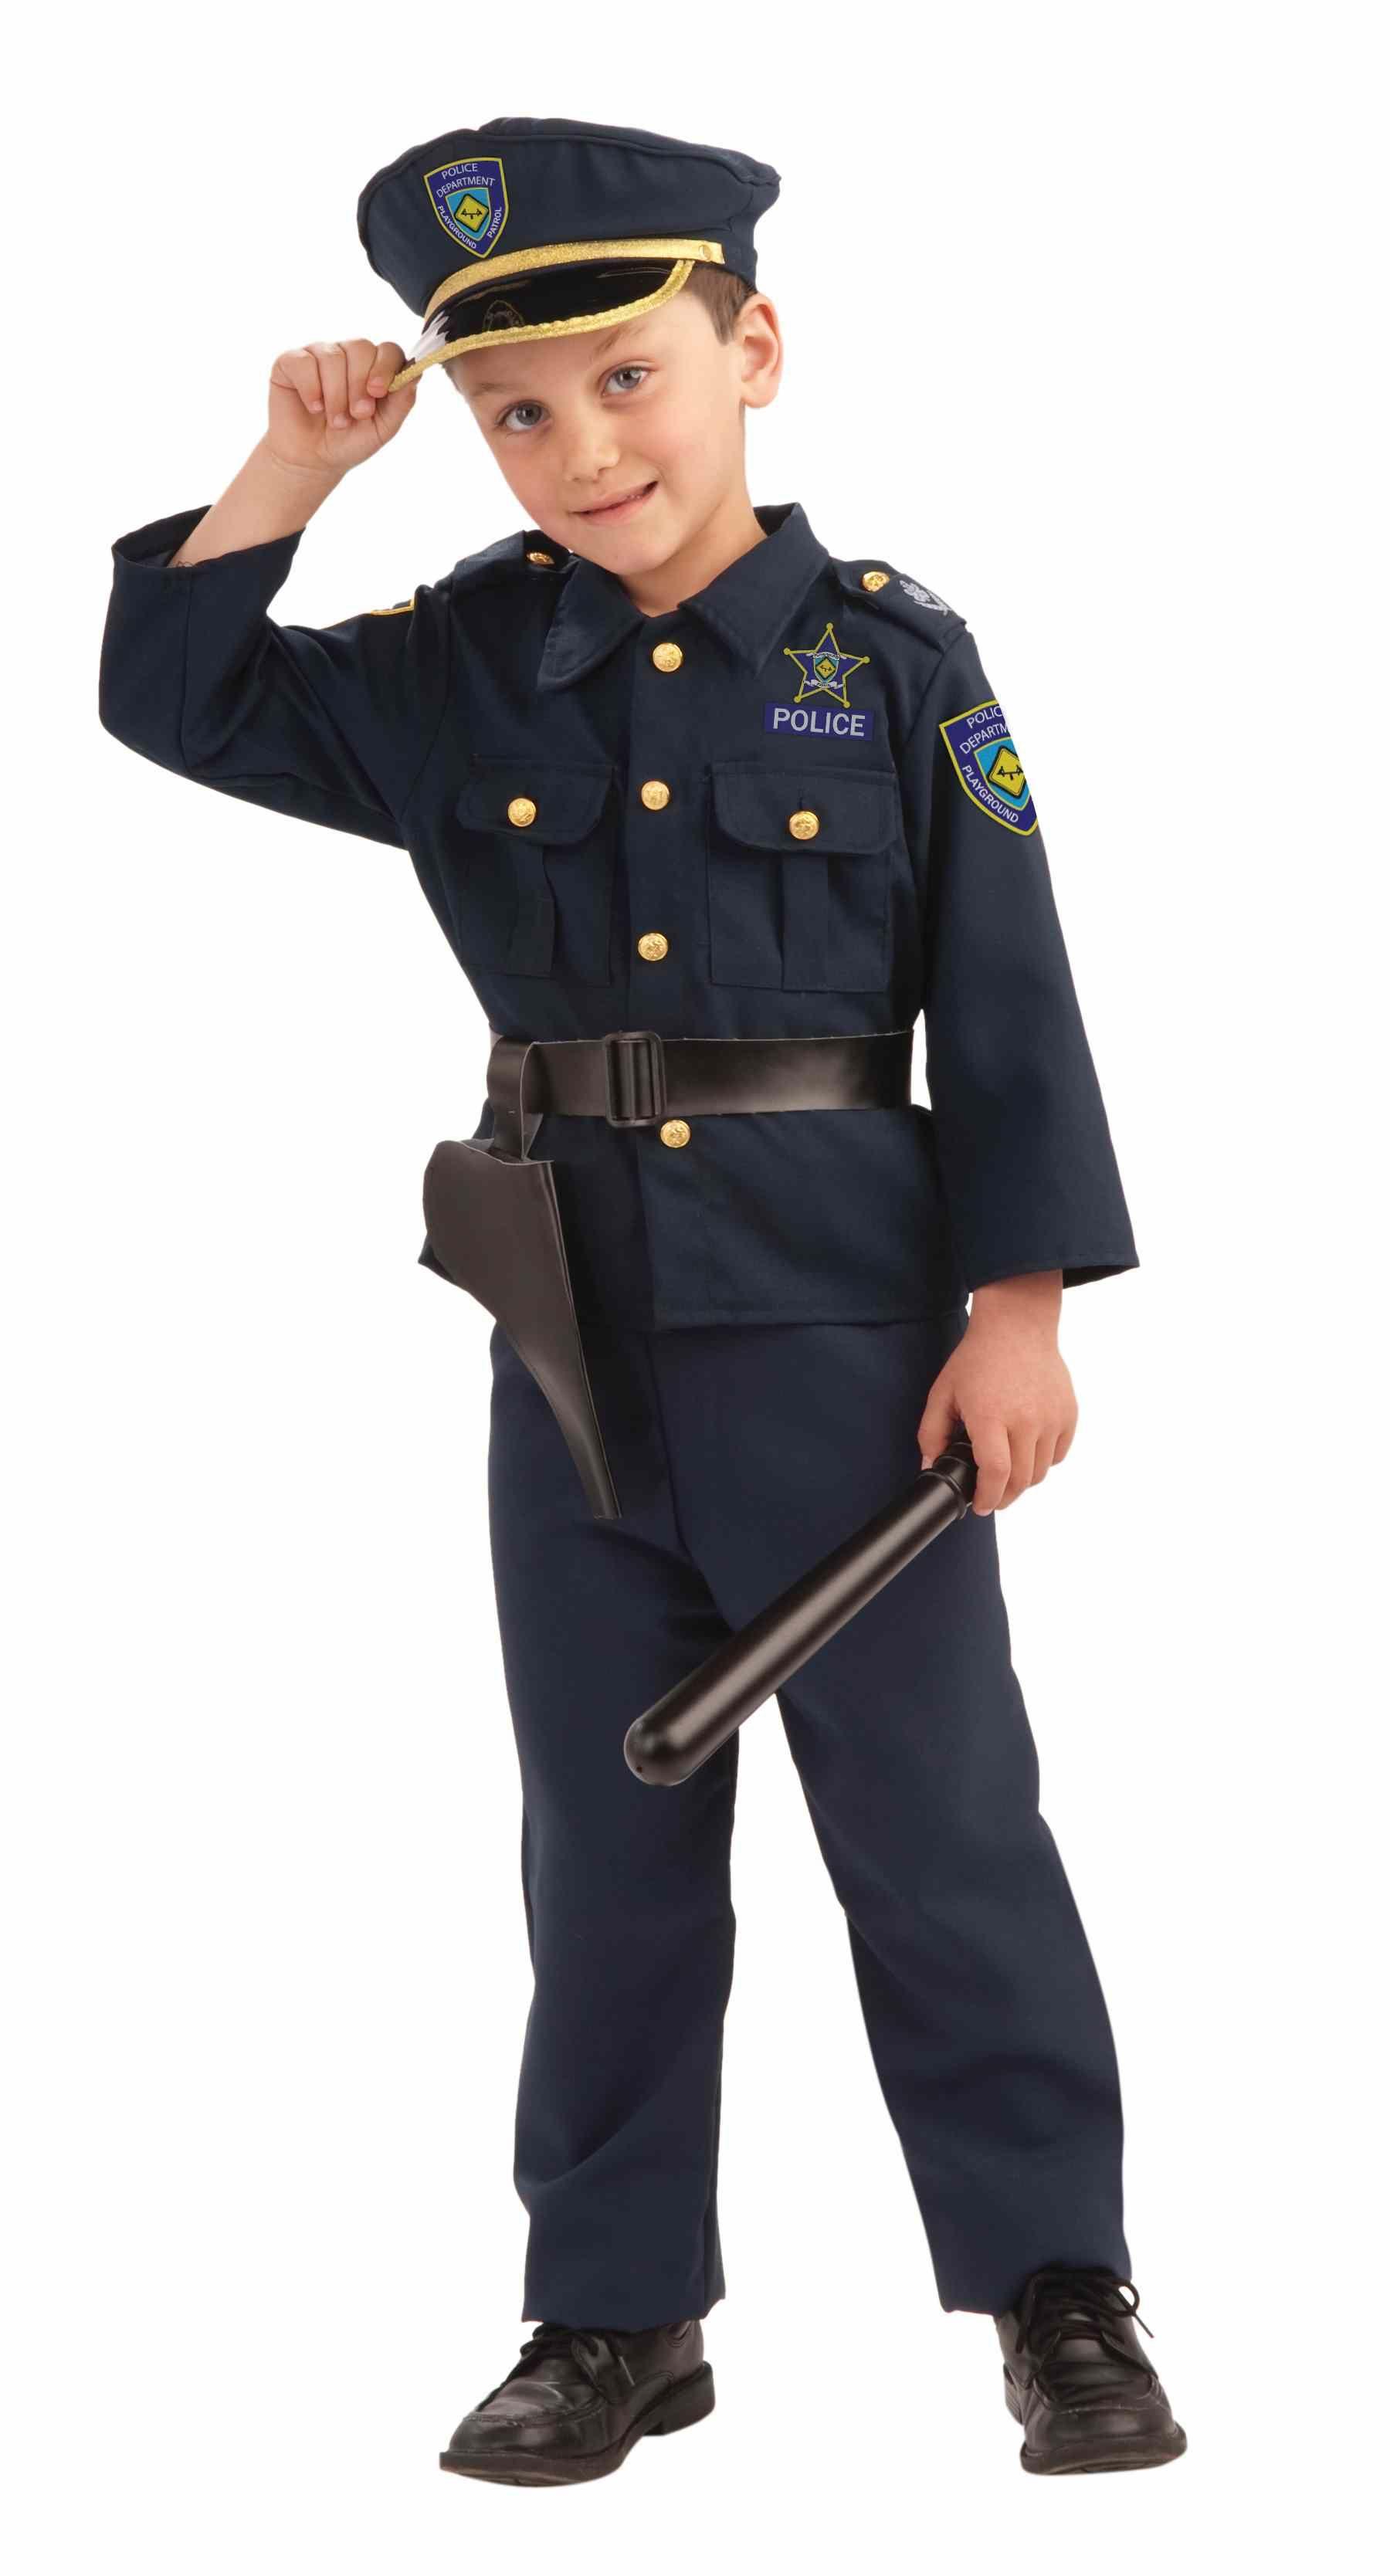 11 DIY Costumes Based on Real Heroes | Police officer uniform, Diy ...